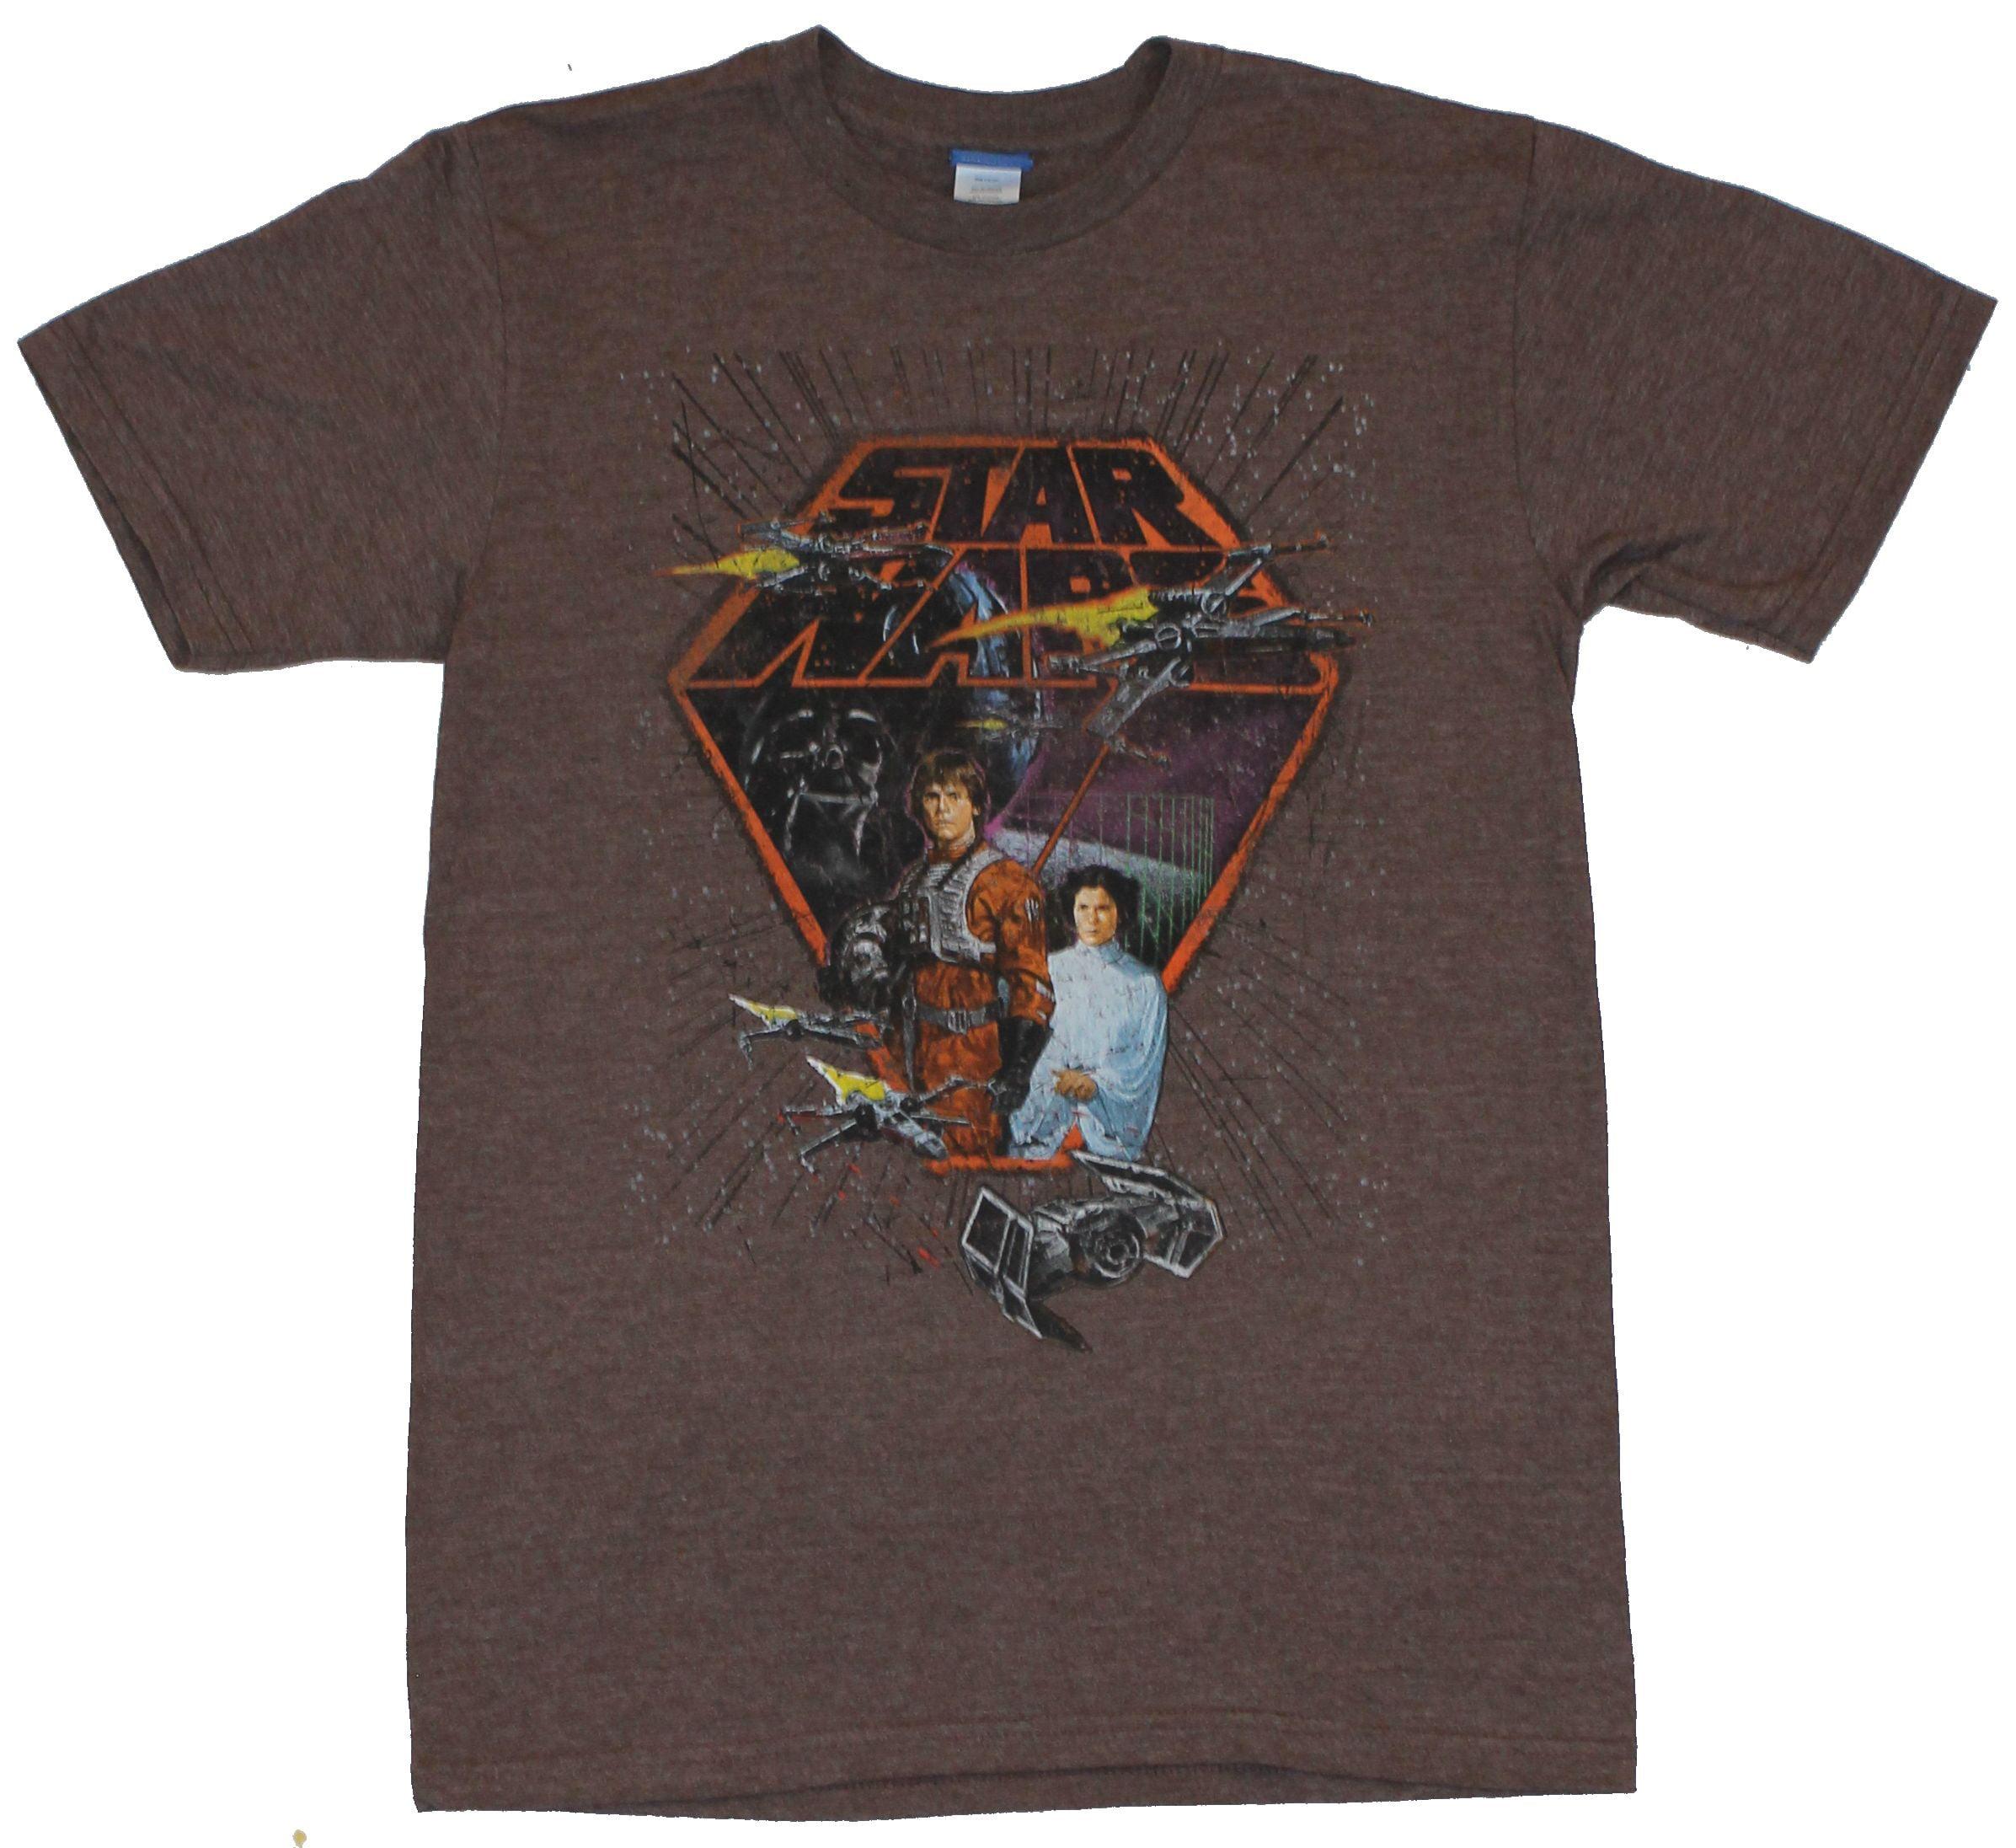 Star Wars Mens T-Shirt -  Classic Luke in X-Wing  Gear with X-Wings Logo